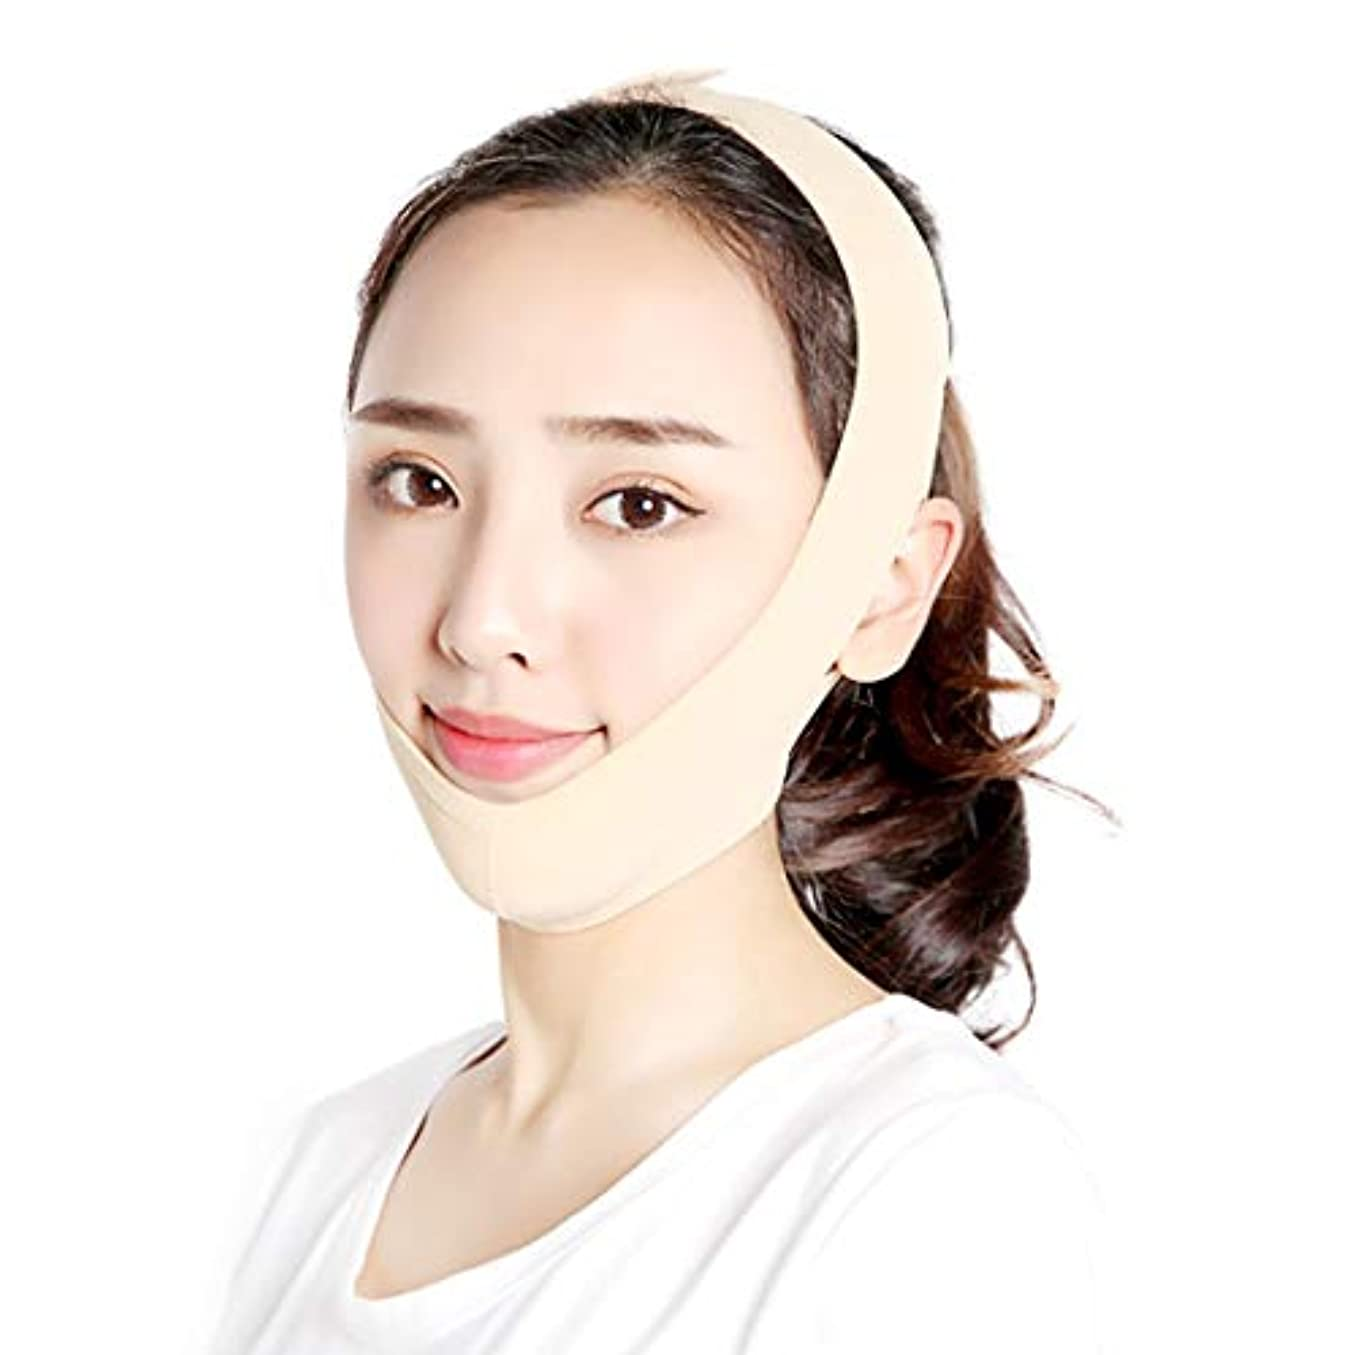 ZWBD フェイスマスク, フェイスリフティング包帯V字型マスクヘッドギアフェイシャルリフティングシェイピングリフティング引き締め (Size : XL)